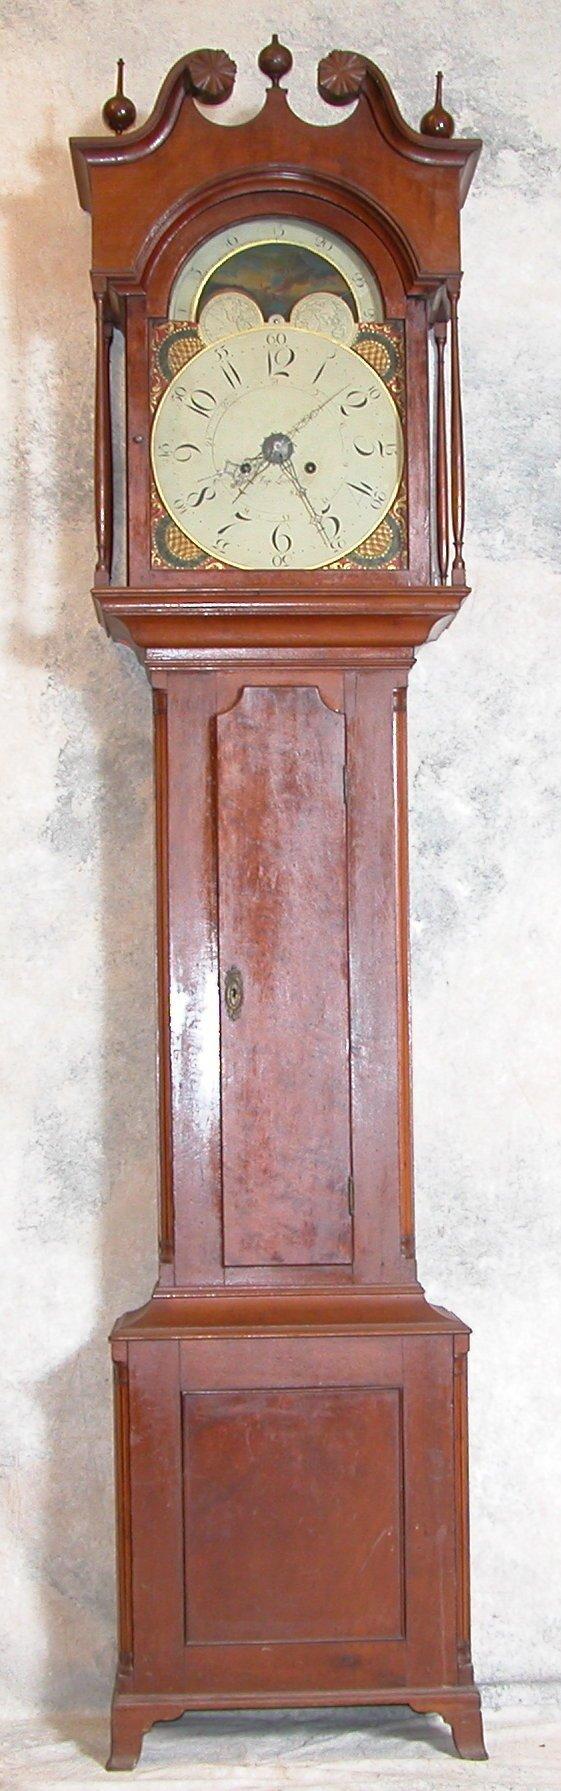 872: Jacob Hage Tall Case Clock.